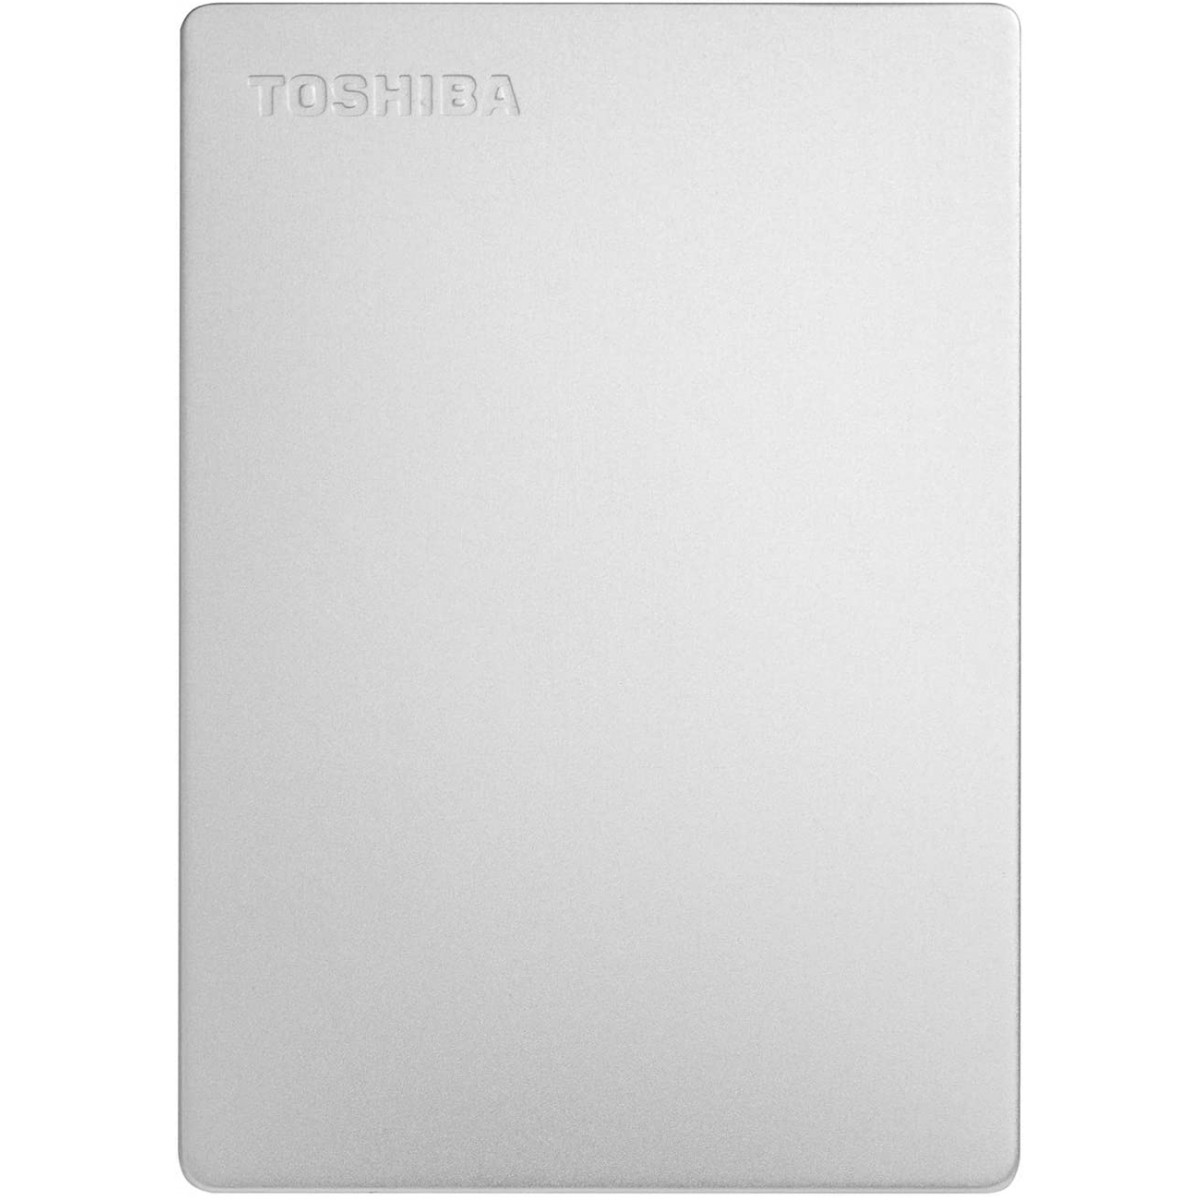 HD Externo Portátil Toshiba Canvio Slim 1TB USB 3.0, Silver, HDTD310XS3DA